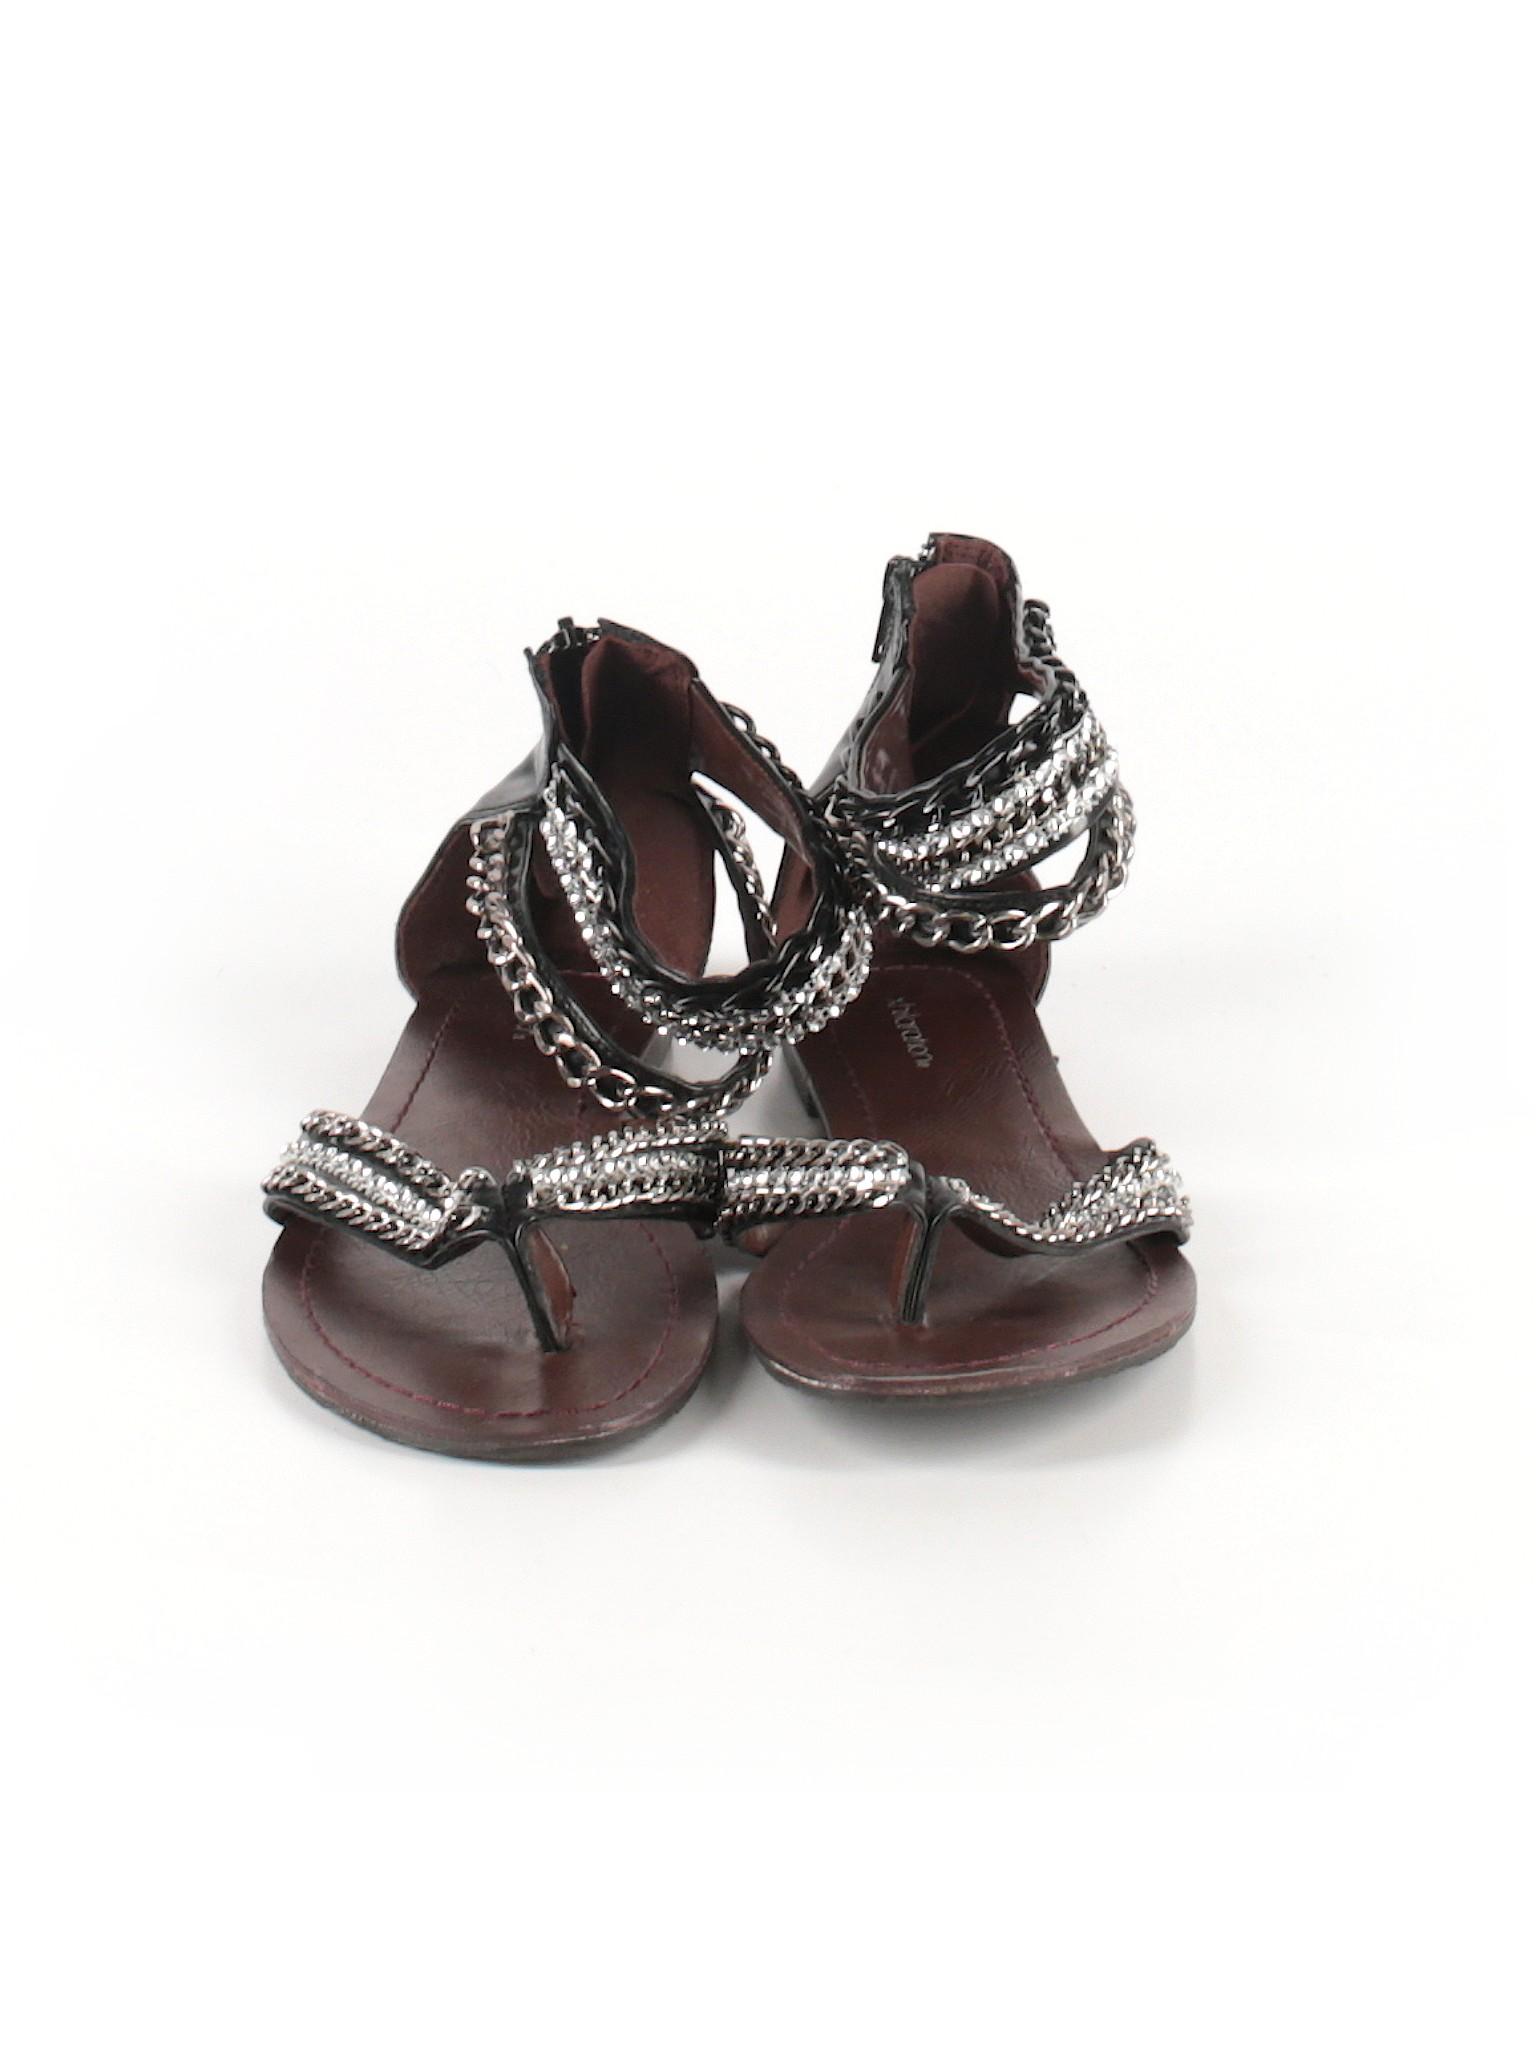 promotion Boutique promotion Xhilaration promotion Boutique Sandals Xhilaration Boutique Sandals Xhilaration Sandals yc7qZpAy8P